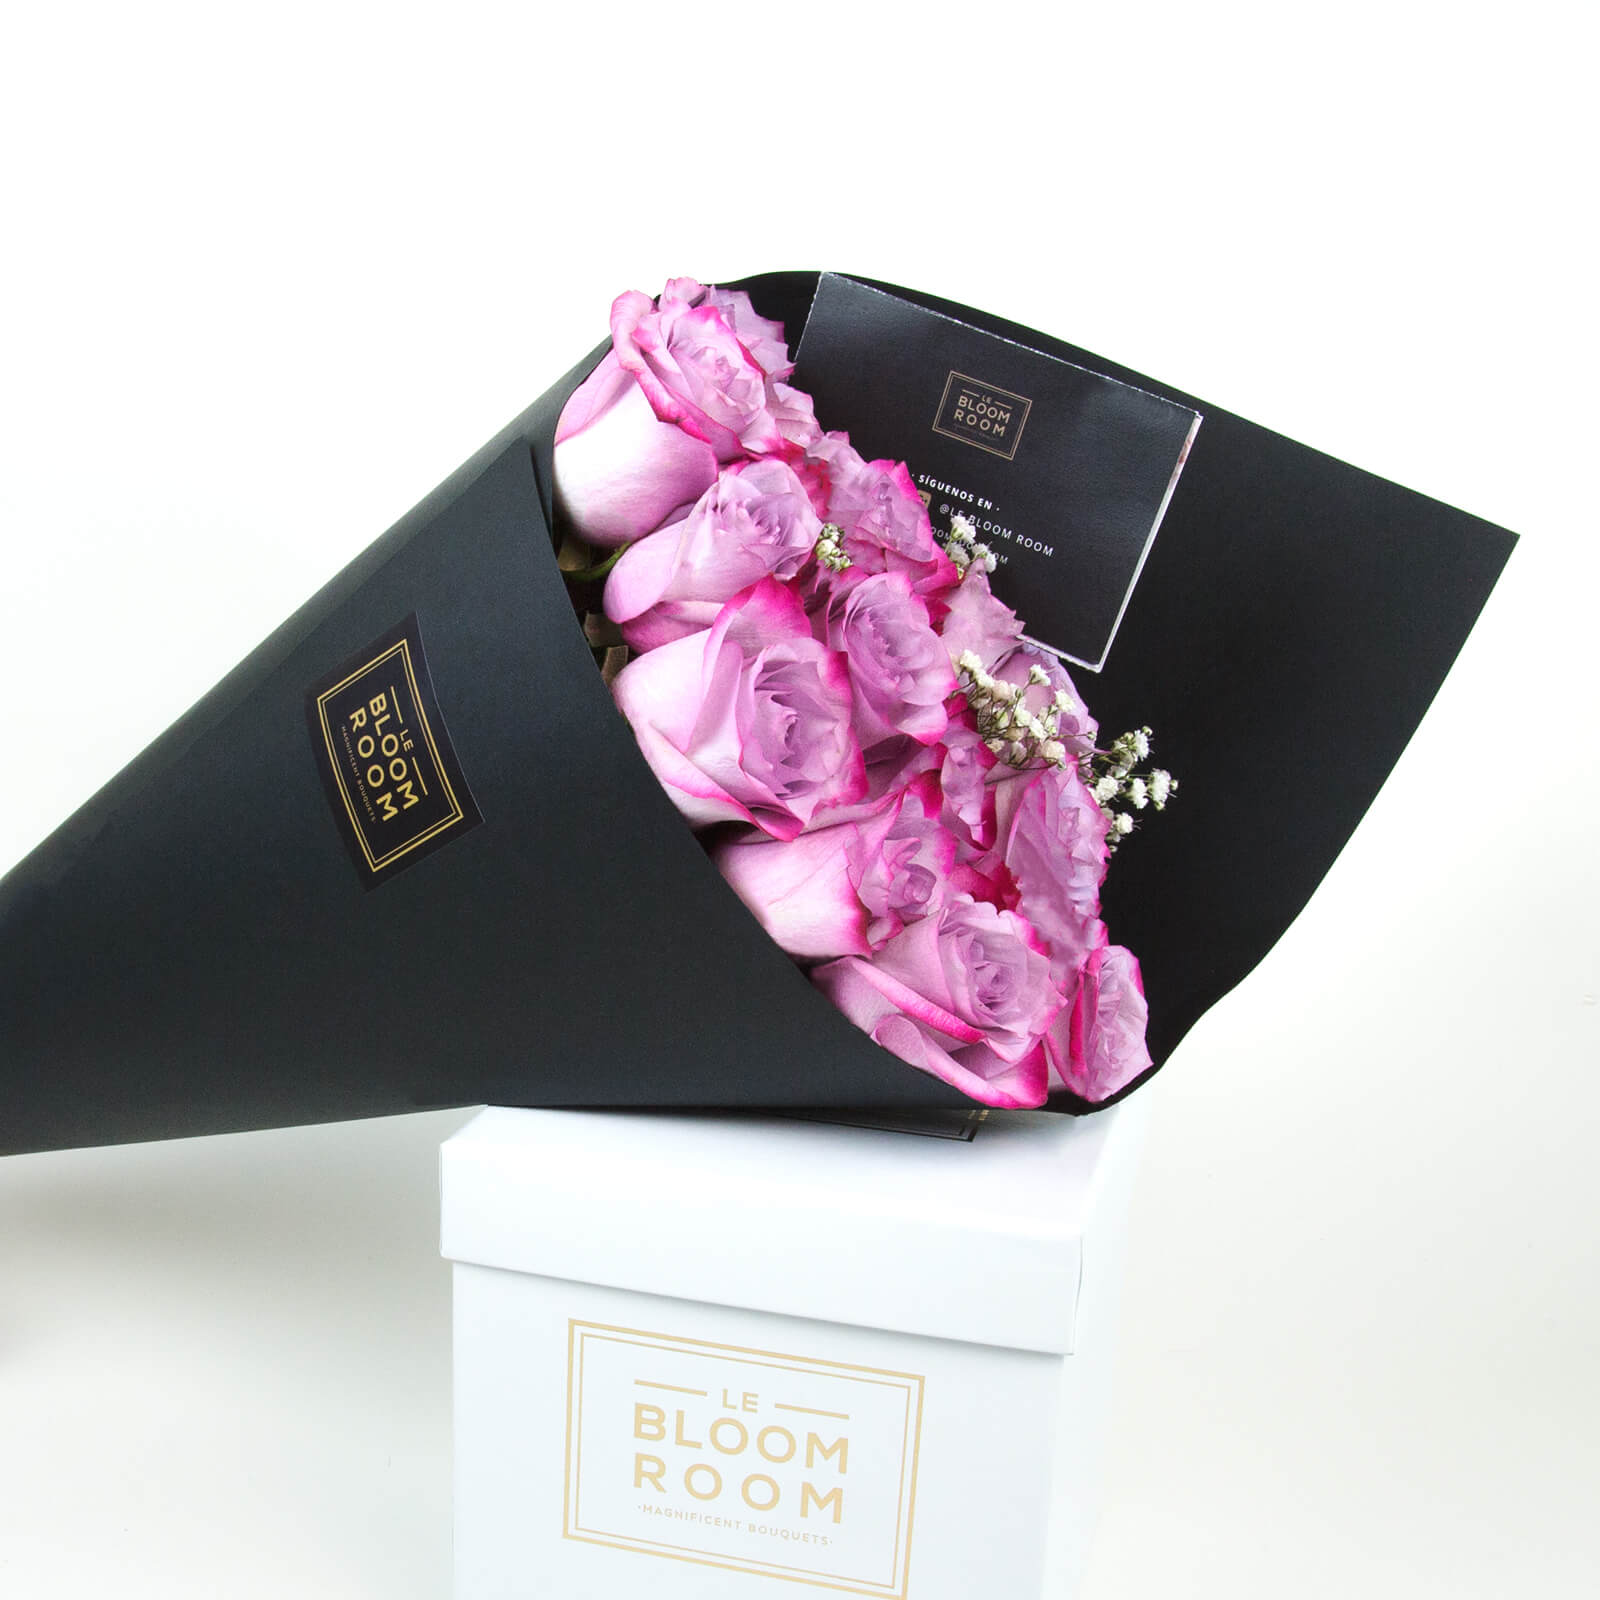 ramo de 12 rosas moradas en cono negro